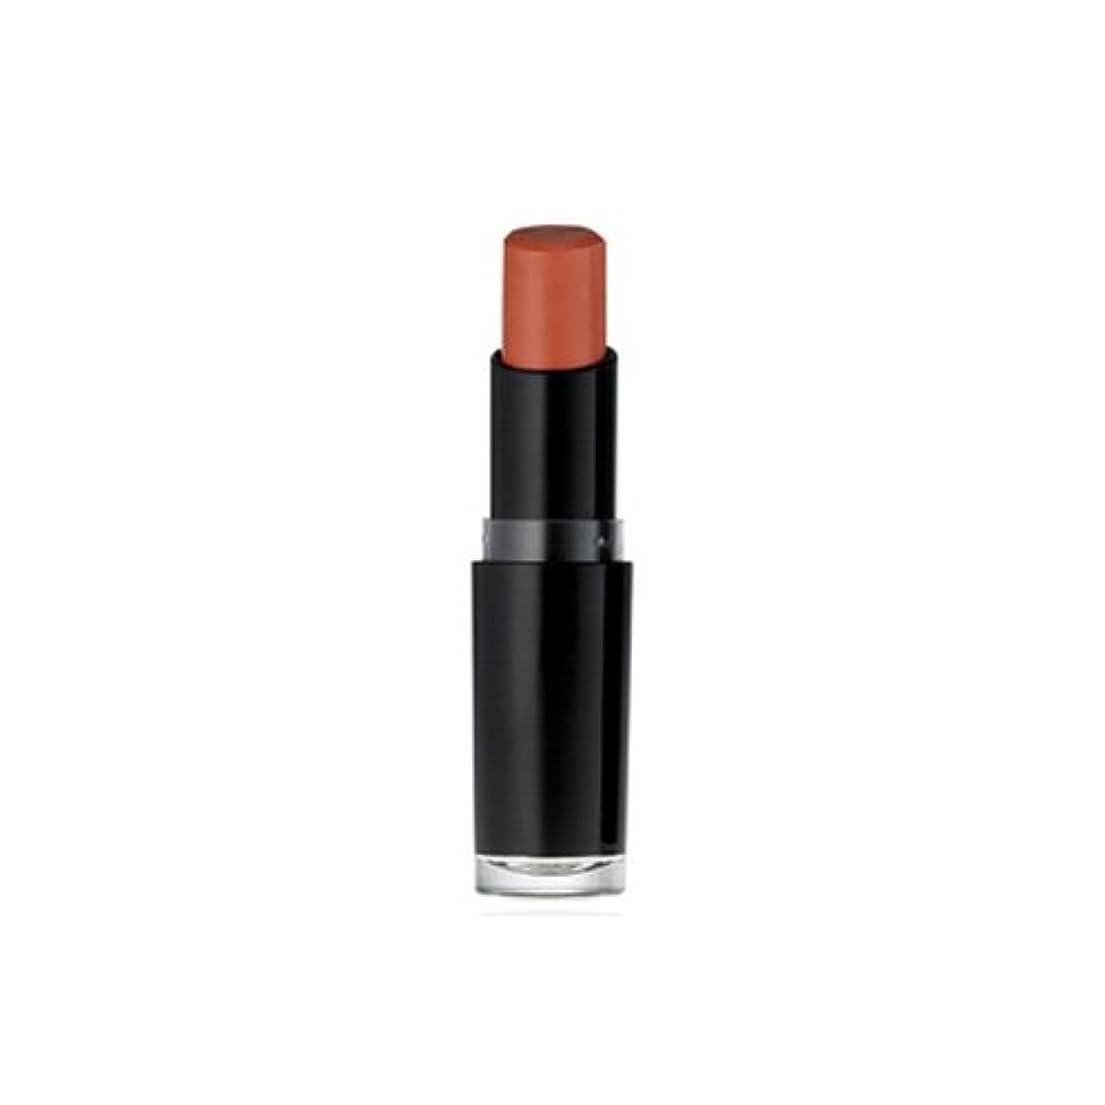 WET N WILD Mega Last Matte Lip Cover - Just Peachy (並行輸入品)